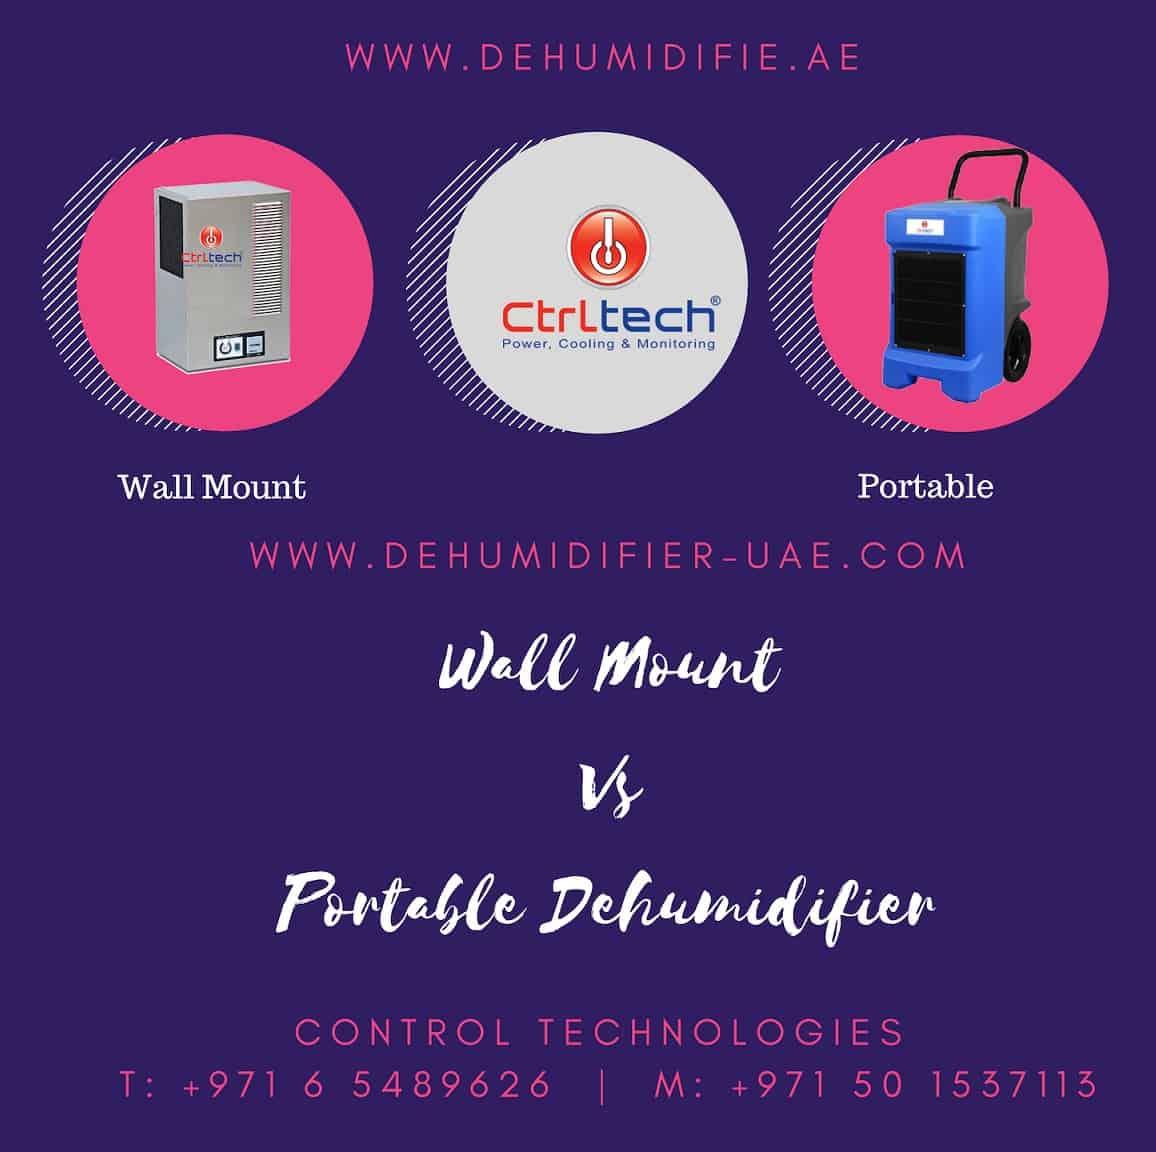 Why Is Dehumidification Important: Comparison Of Wall Mounted Dehumidifier And Portable Dehumidifier In UAE, Qatar, Saudi Arabia